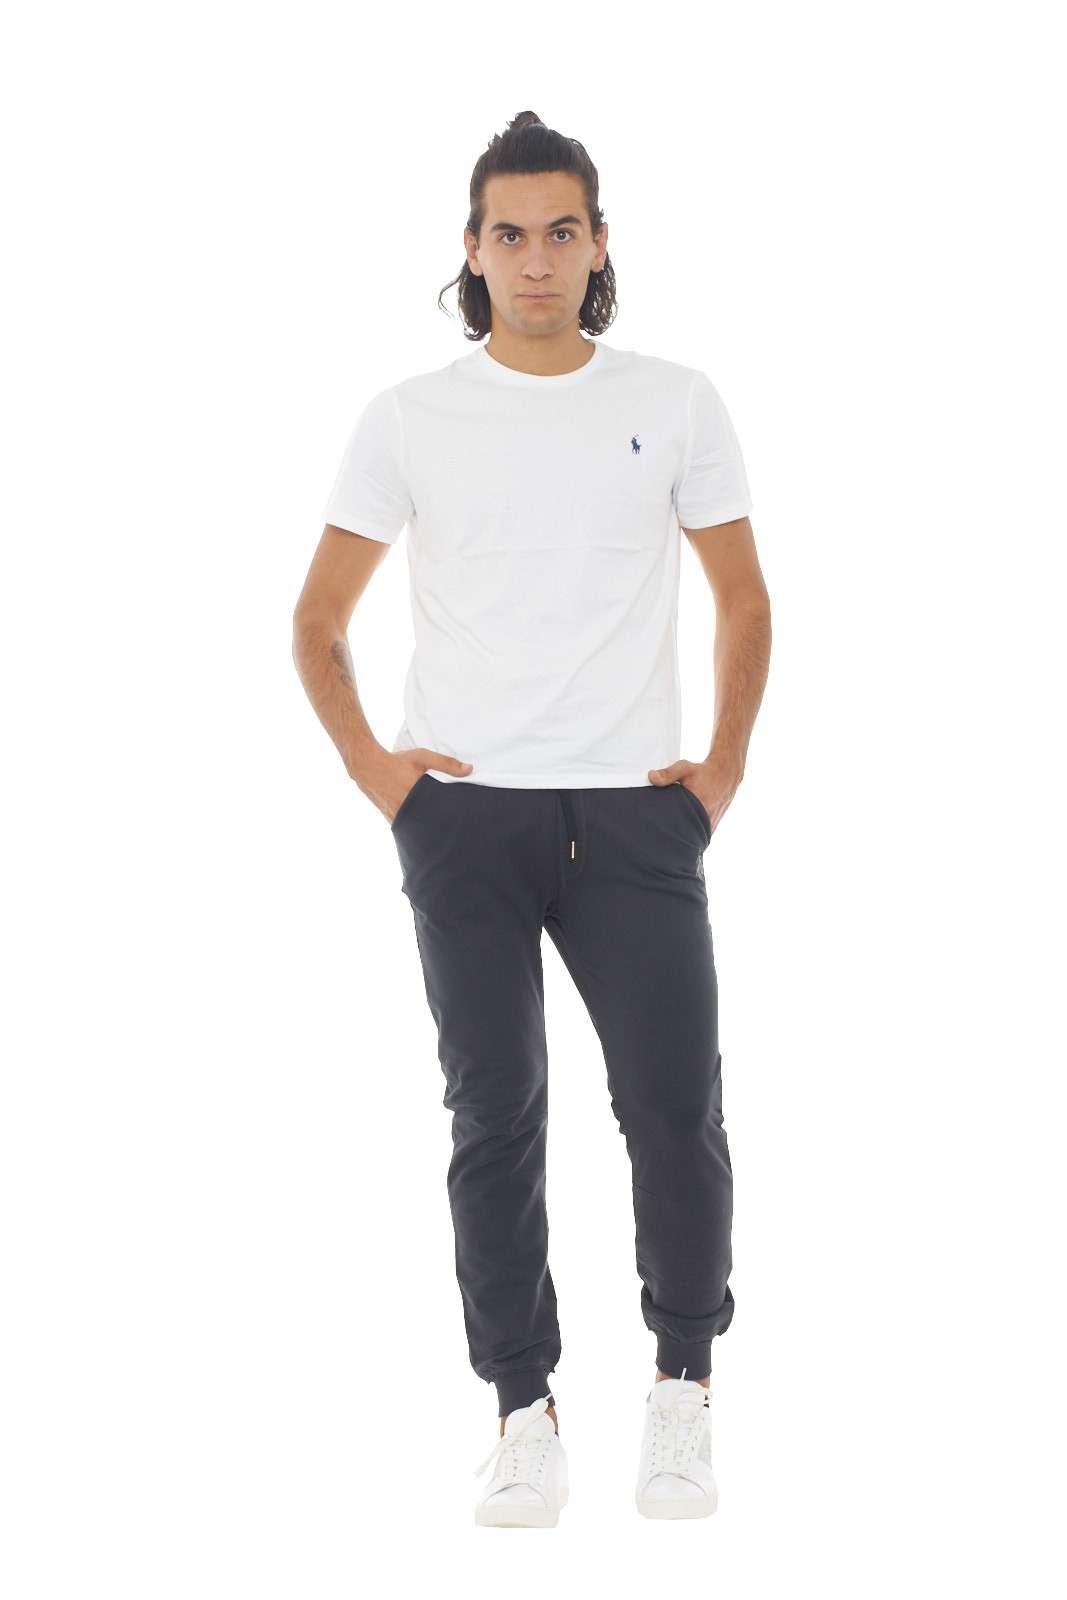 https://www.parmax.com/media/catalog/product/a/i/AI-outlet_parmax-pantaloni-uomo-Us-Polo-43300-D.jpg